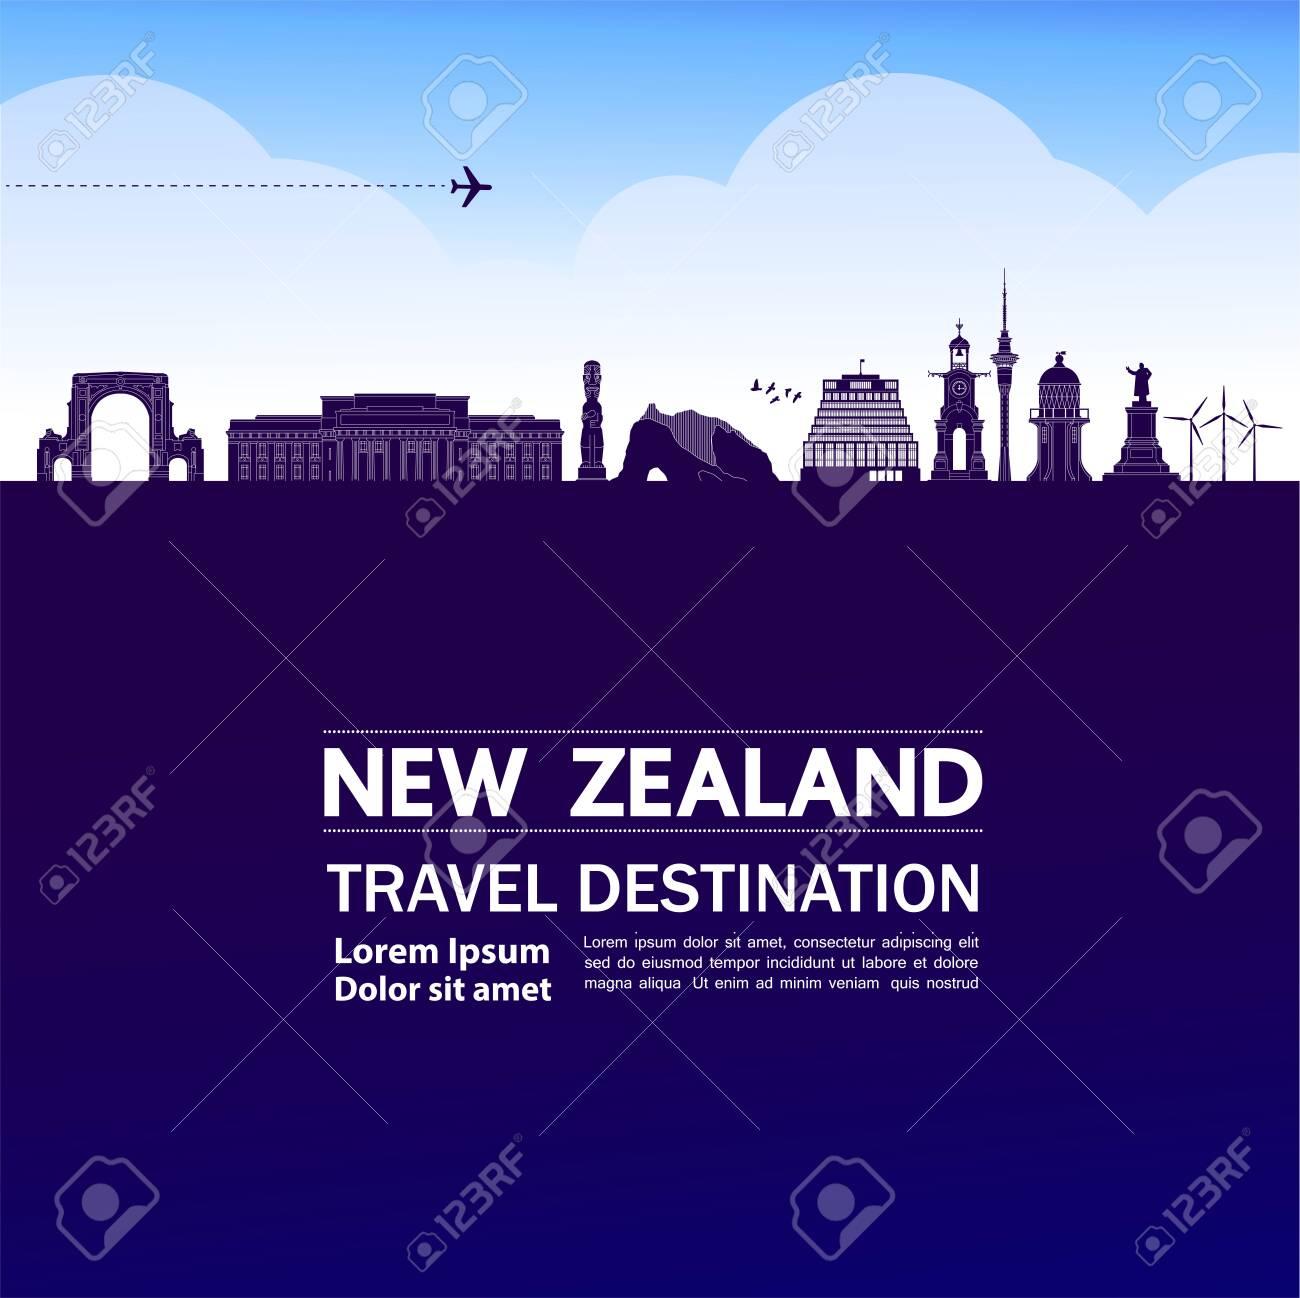 New Zealand travel destination grand vector illustration. - 133341309